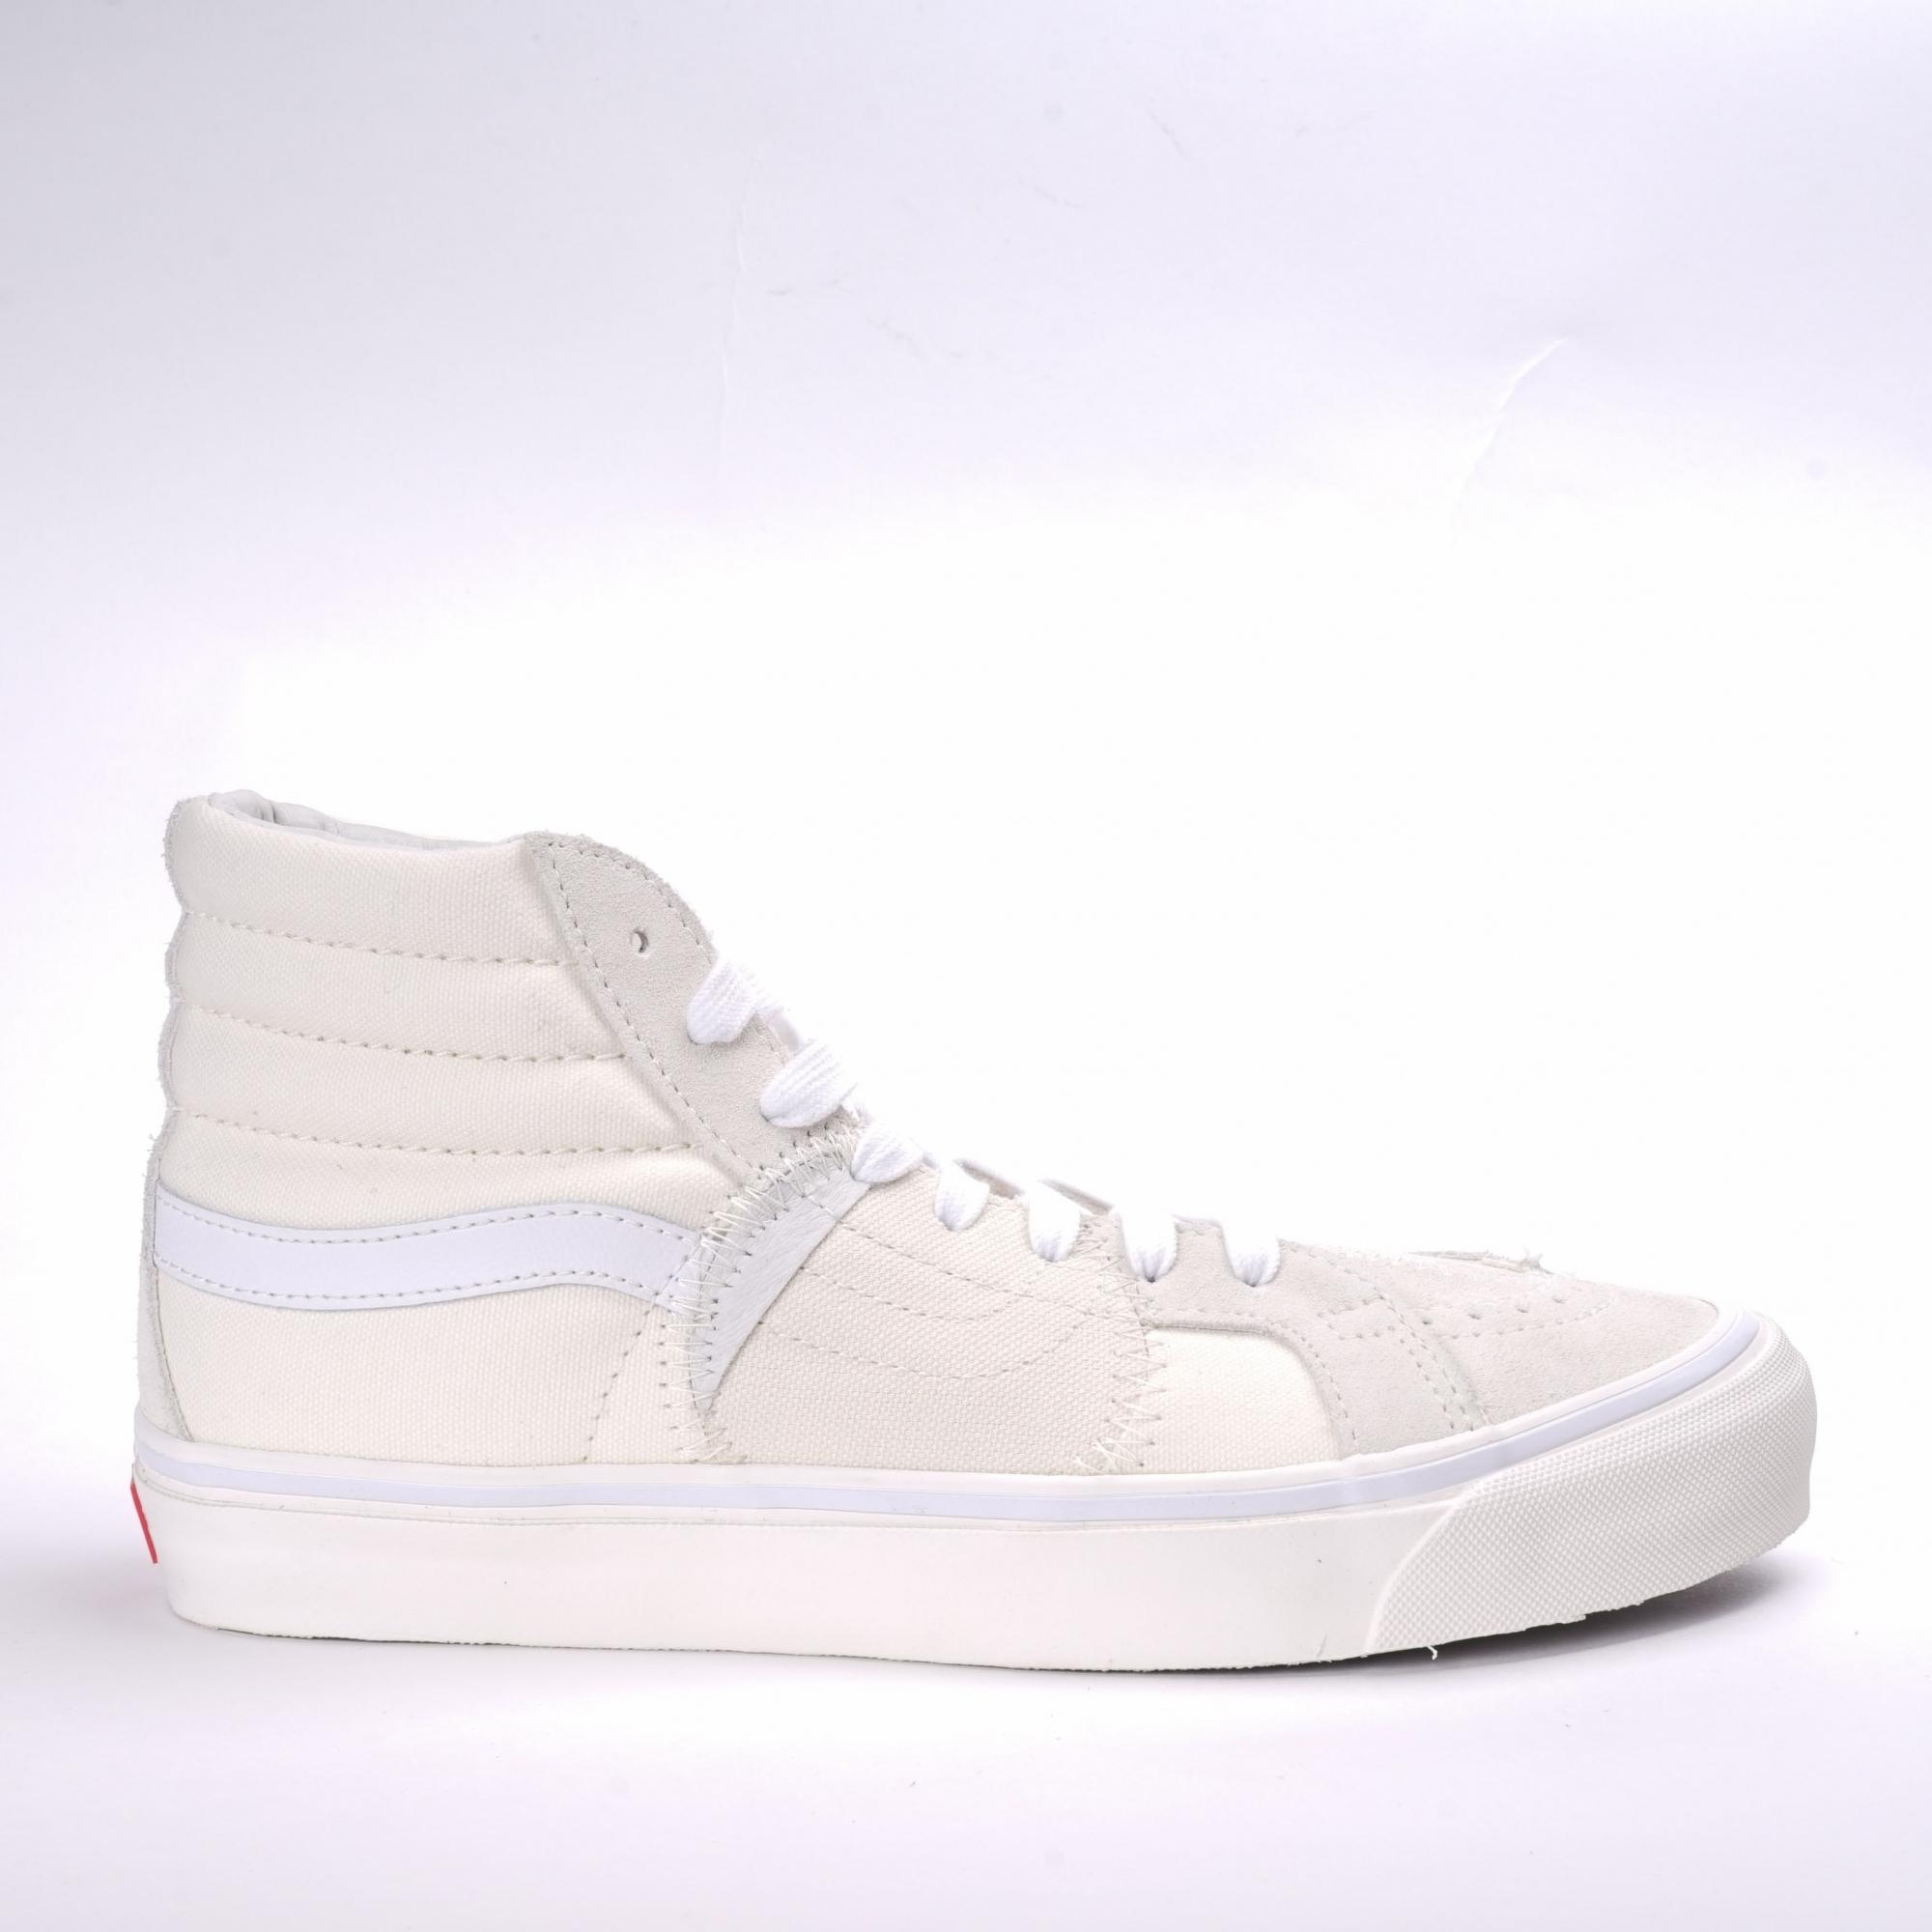 d1285b9185 VANS SK8-Hi Bricolage VINTAGE WHITE - Slash Store